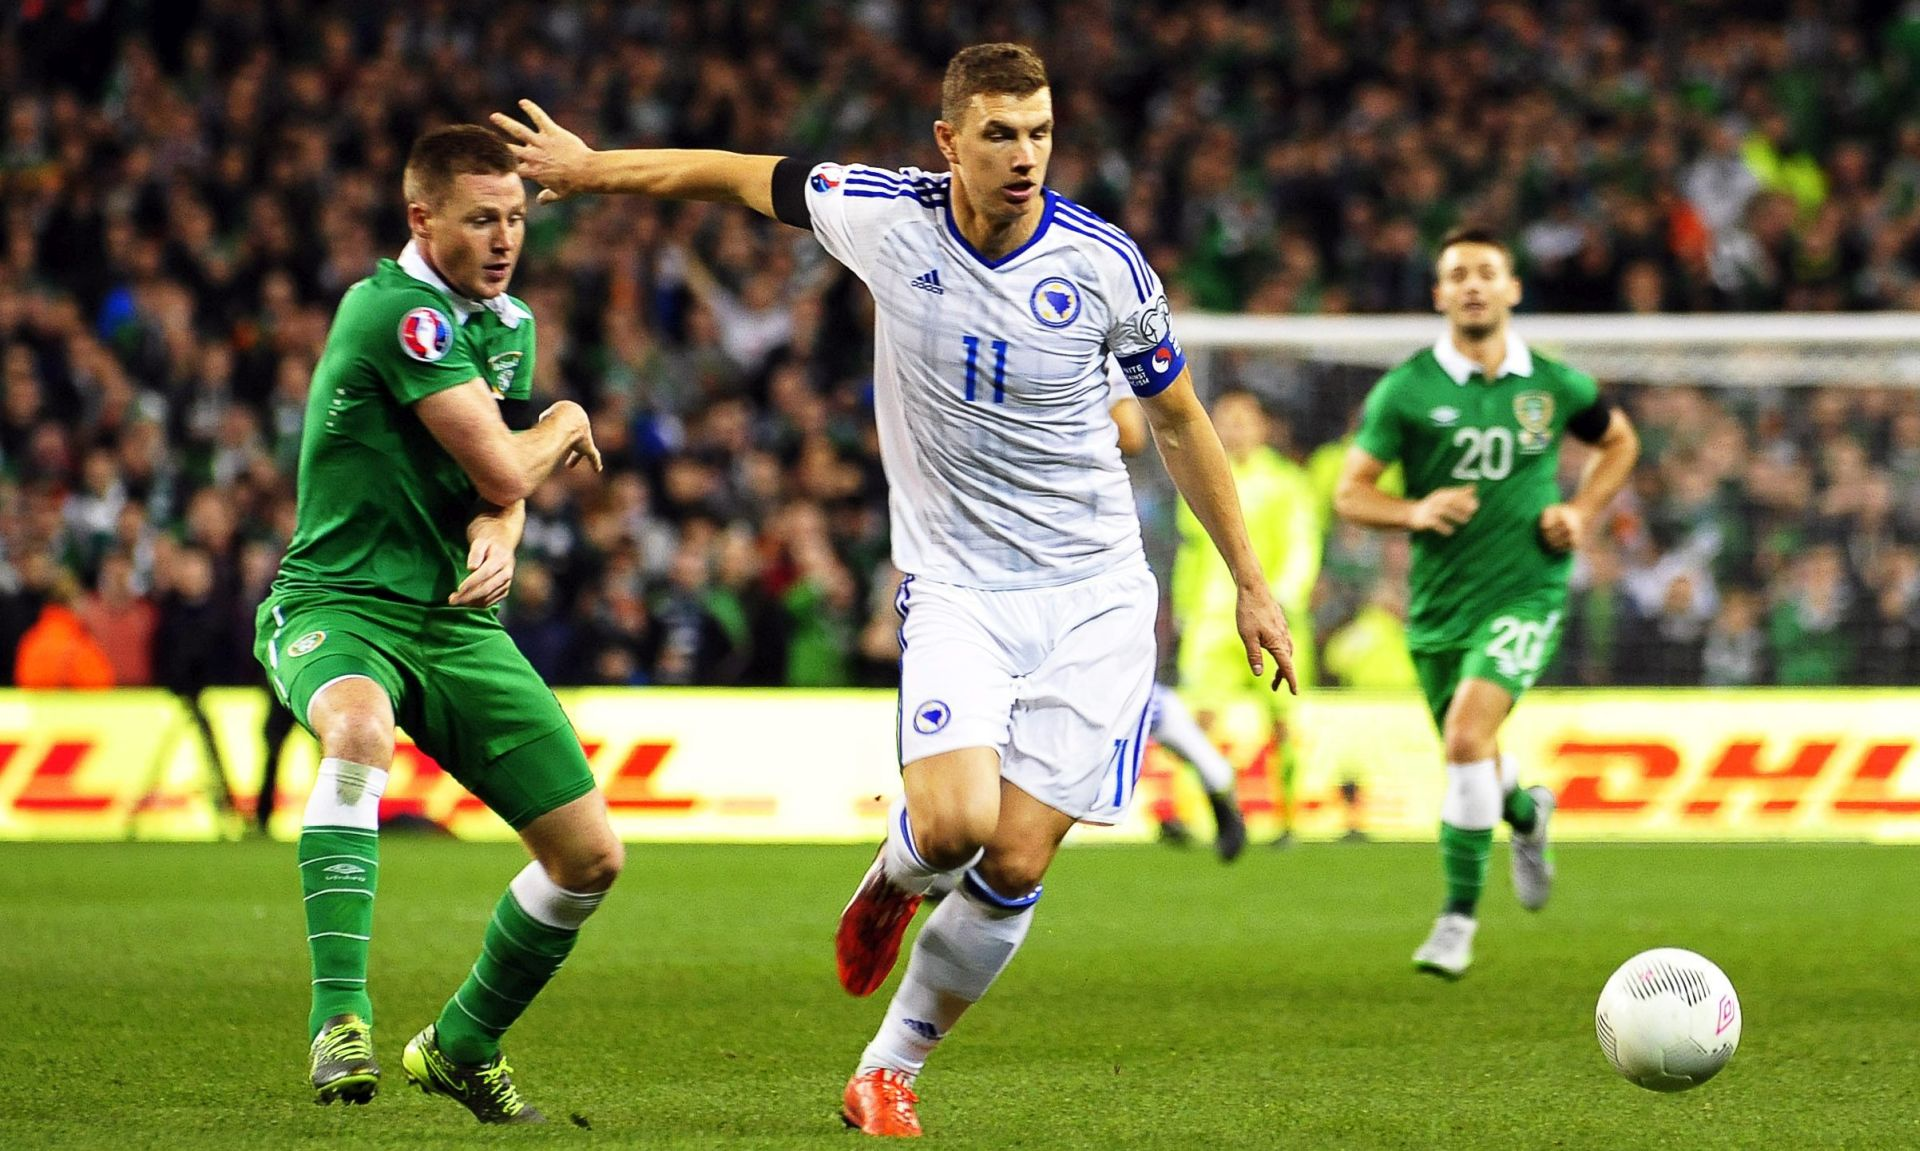 WALTERS SRUŠIO 'ZMAJEVE' Irska izborila Europsko prvenstvo